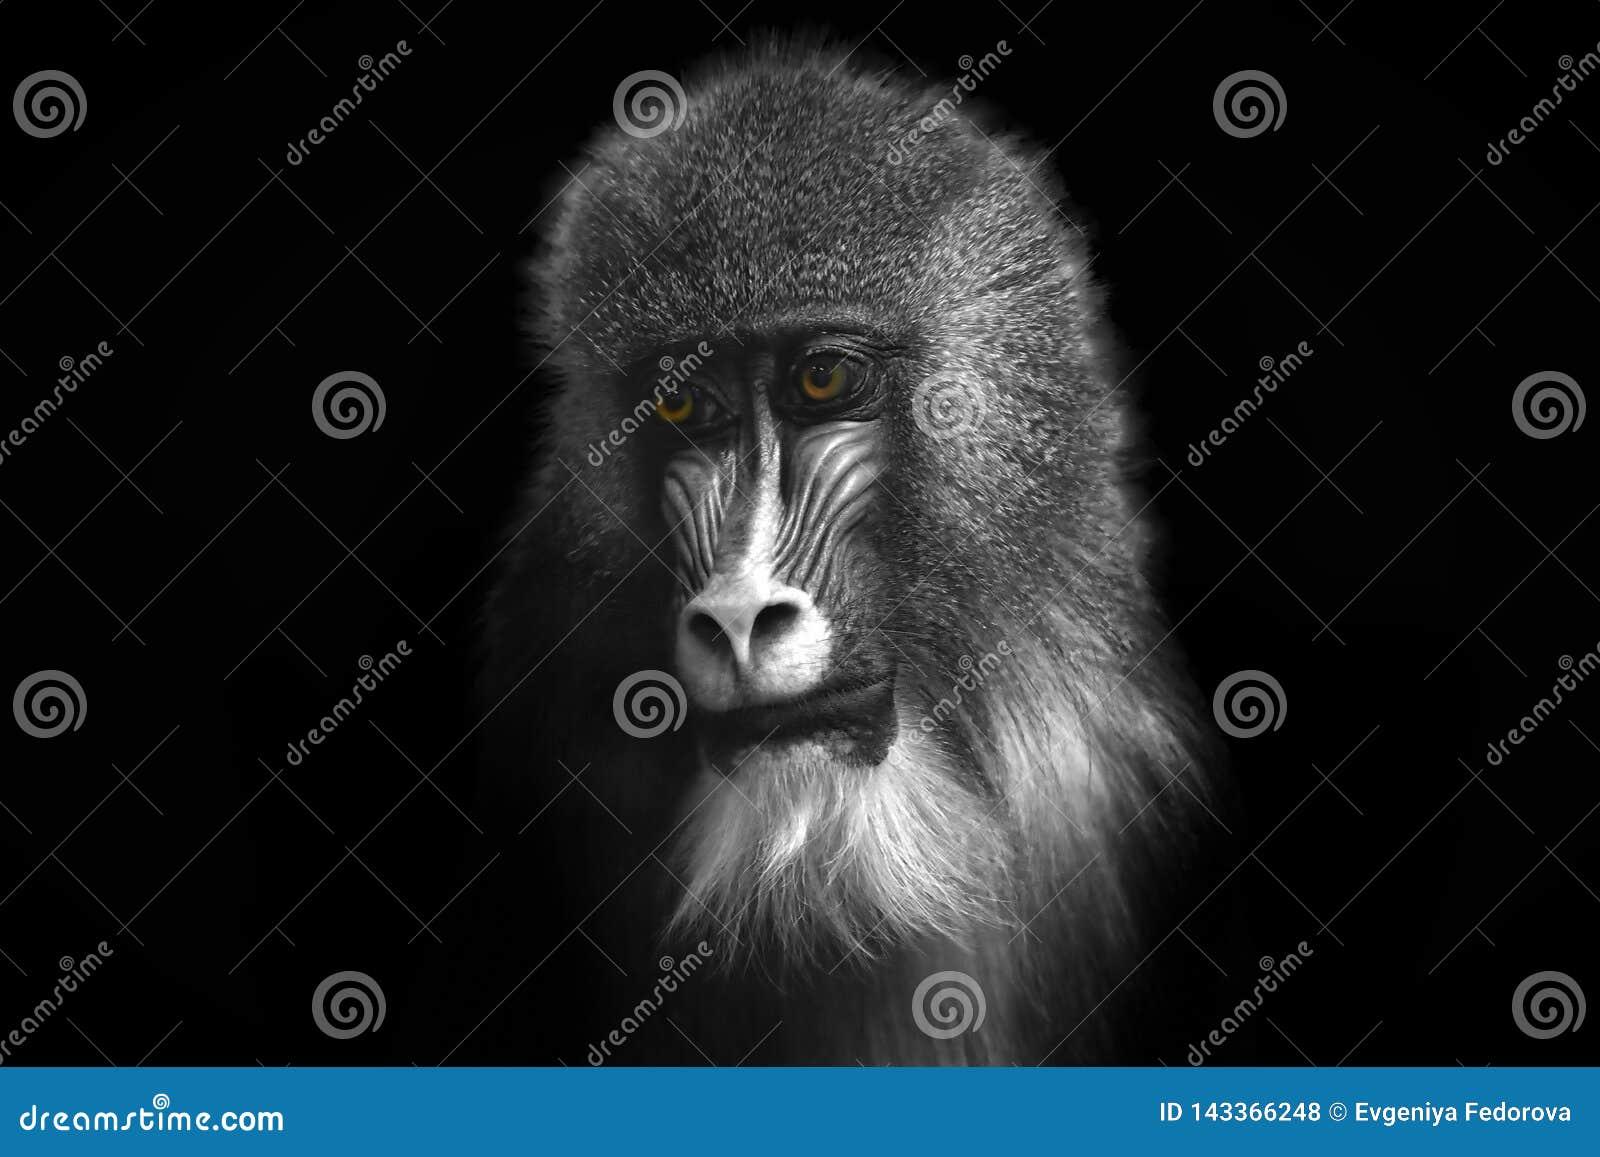 Black and white image of a monkey with bright orange eyes